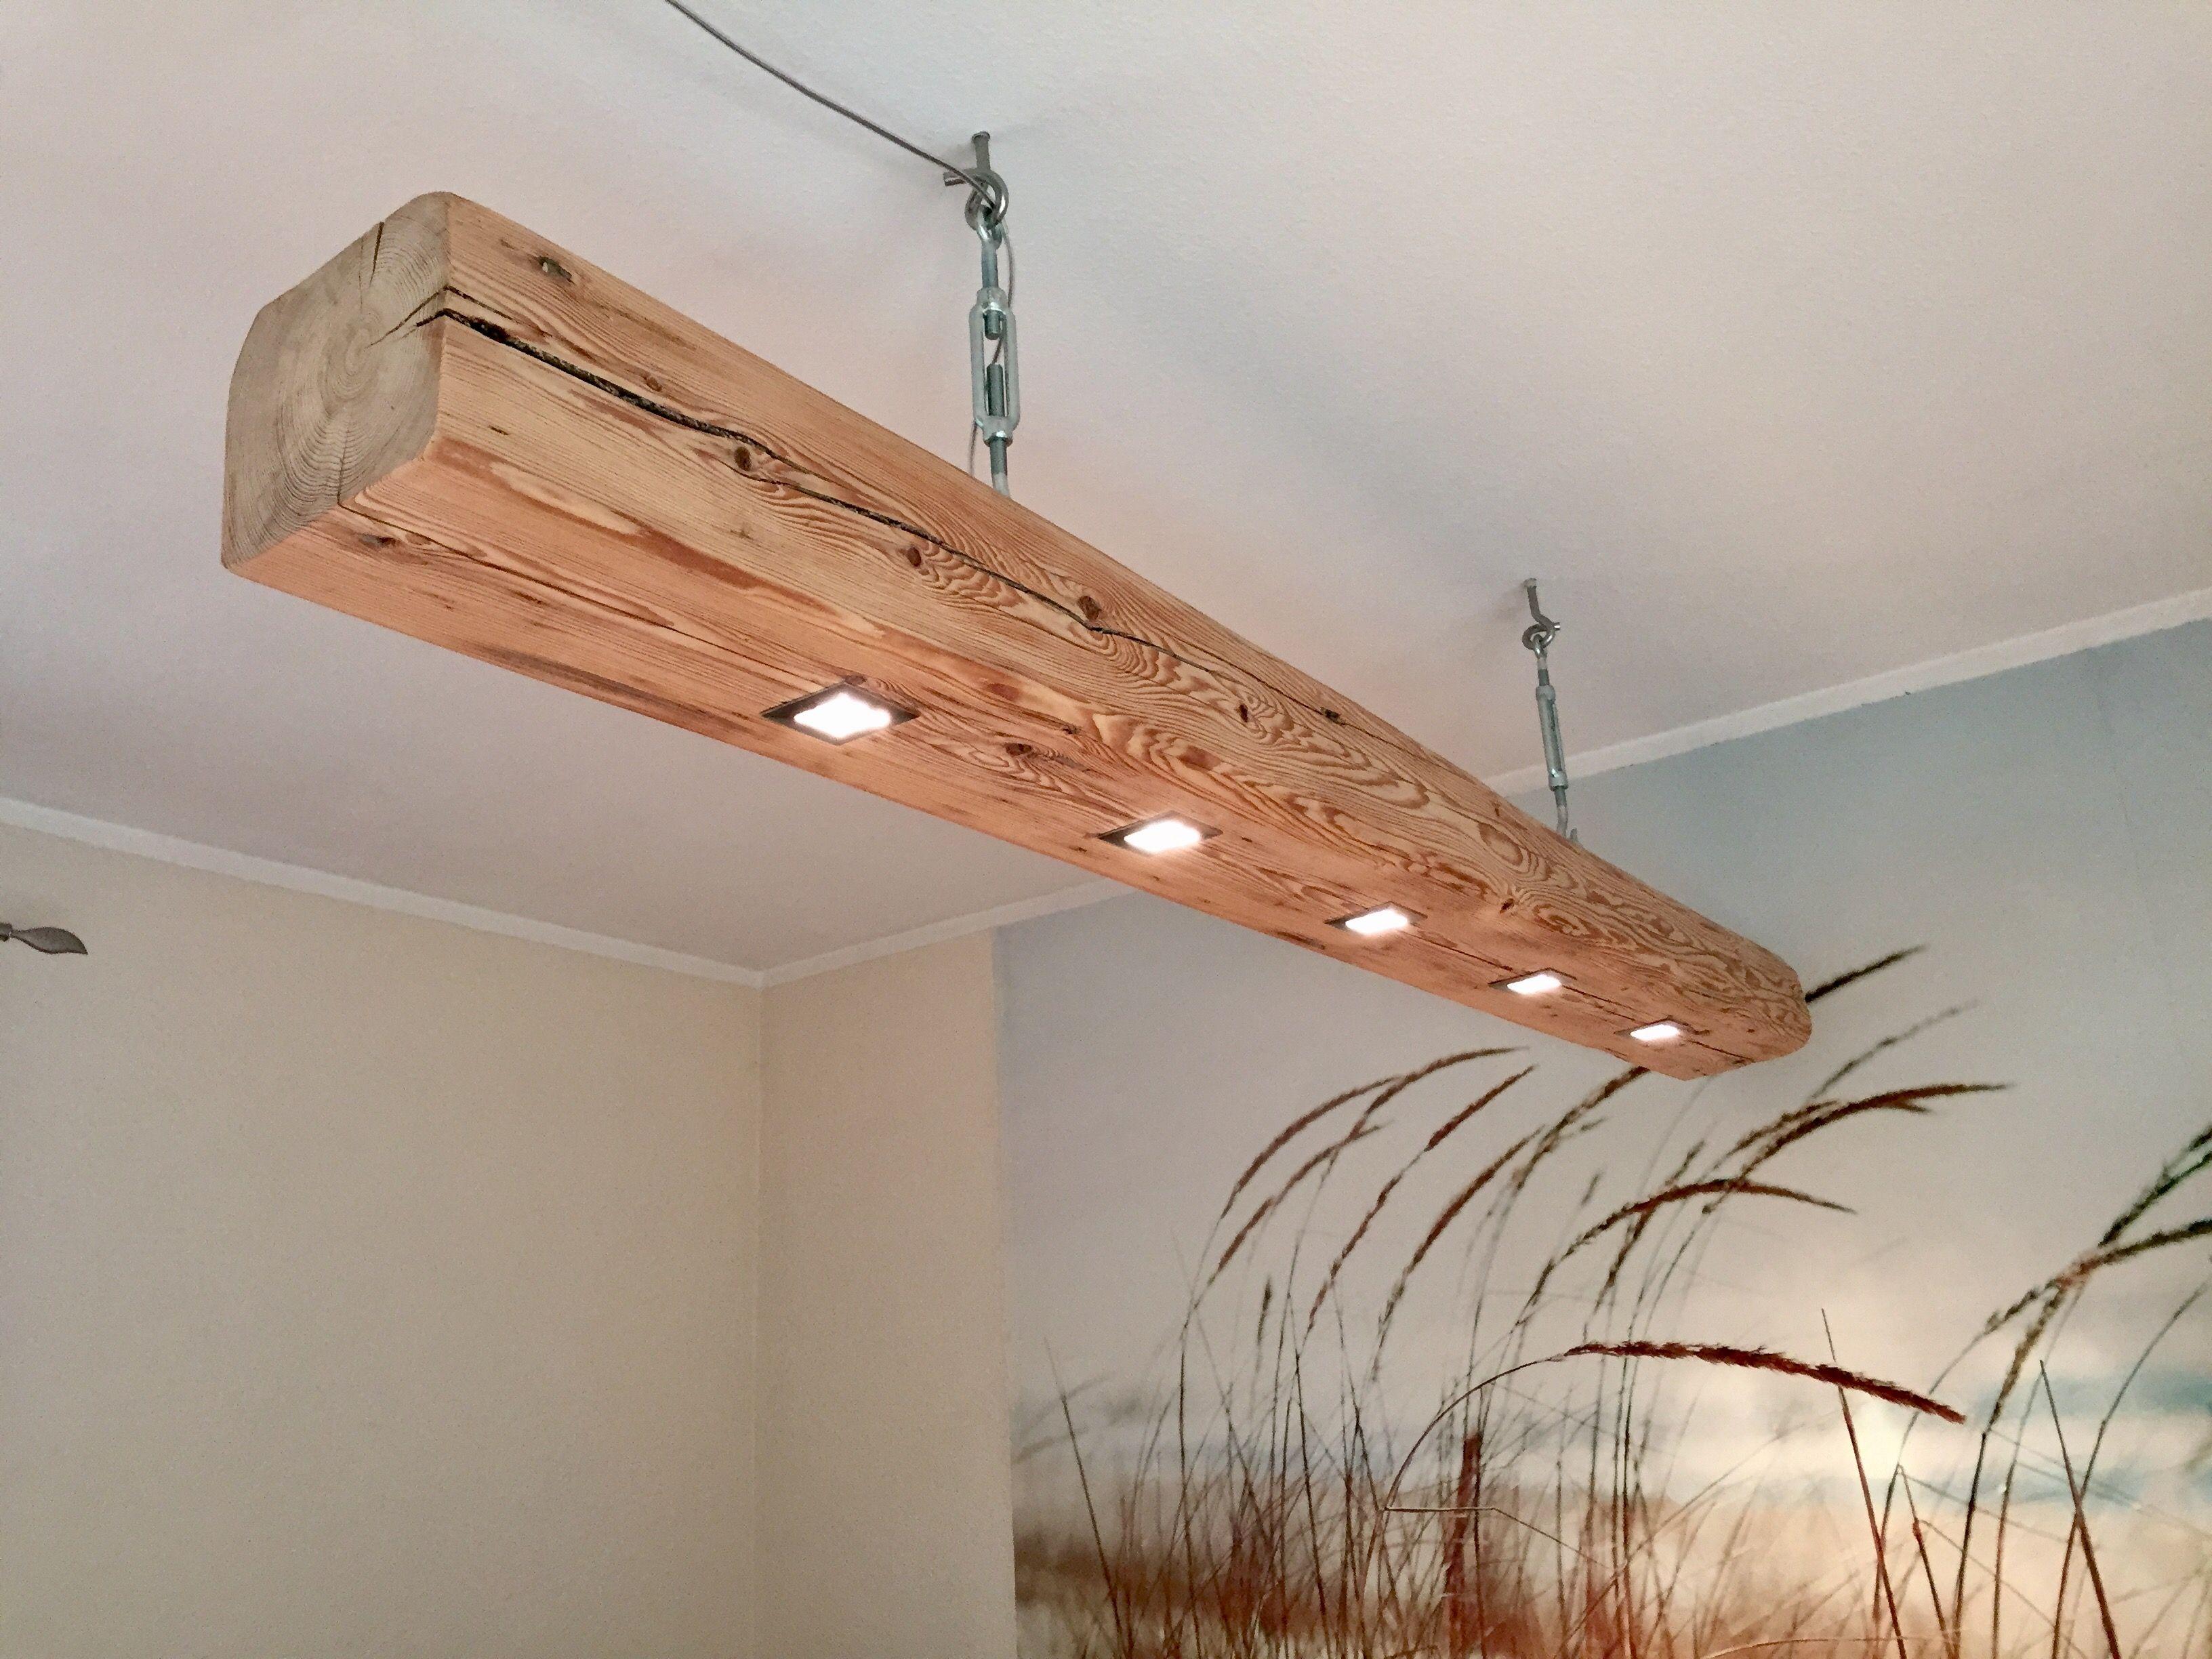 Deckenlampe Holzbalken mit Led´s | Lampen, Deckenlampe, Lampe